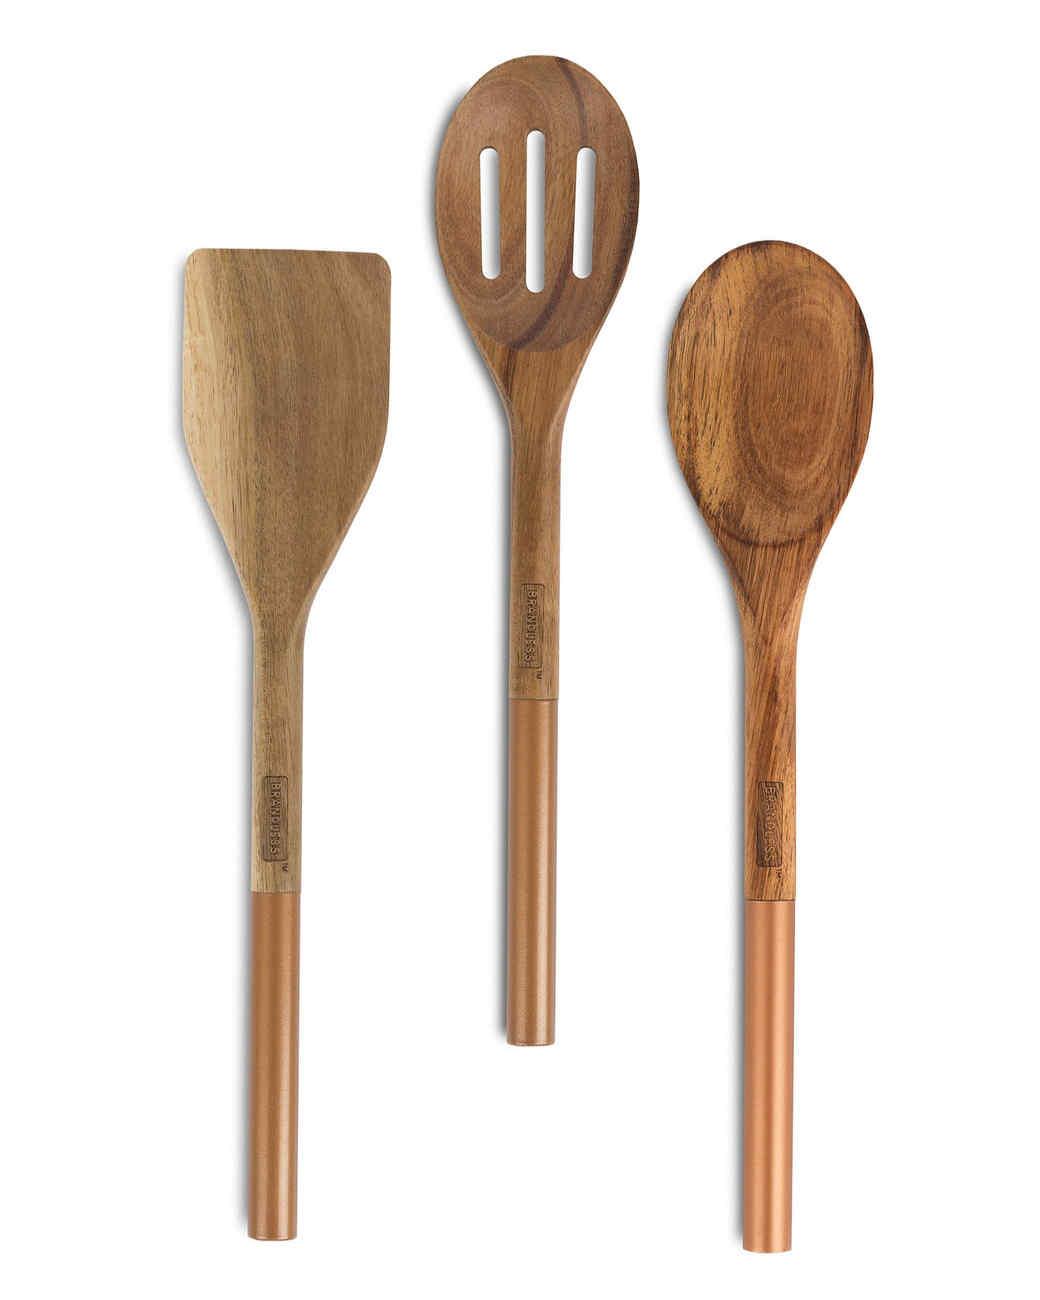 brandless wooden spoons